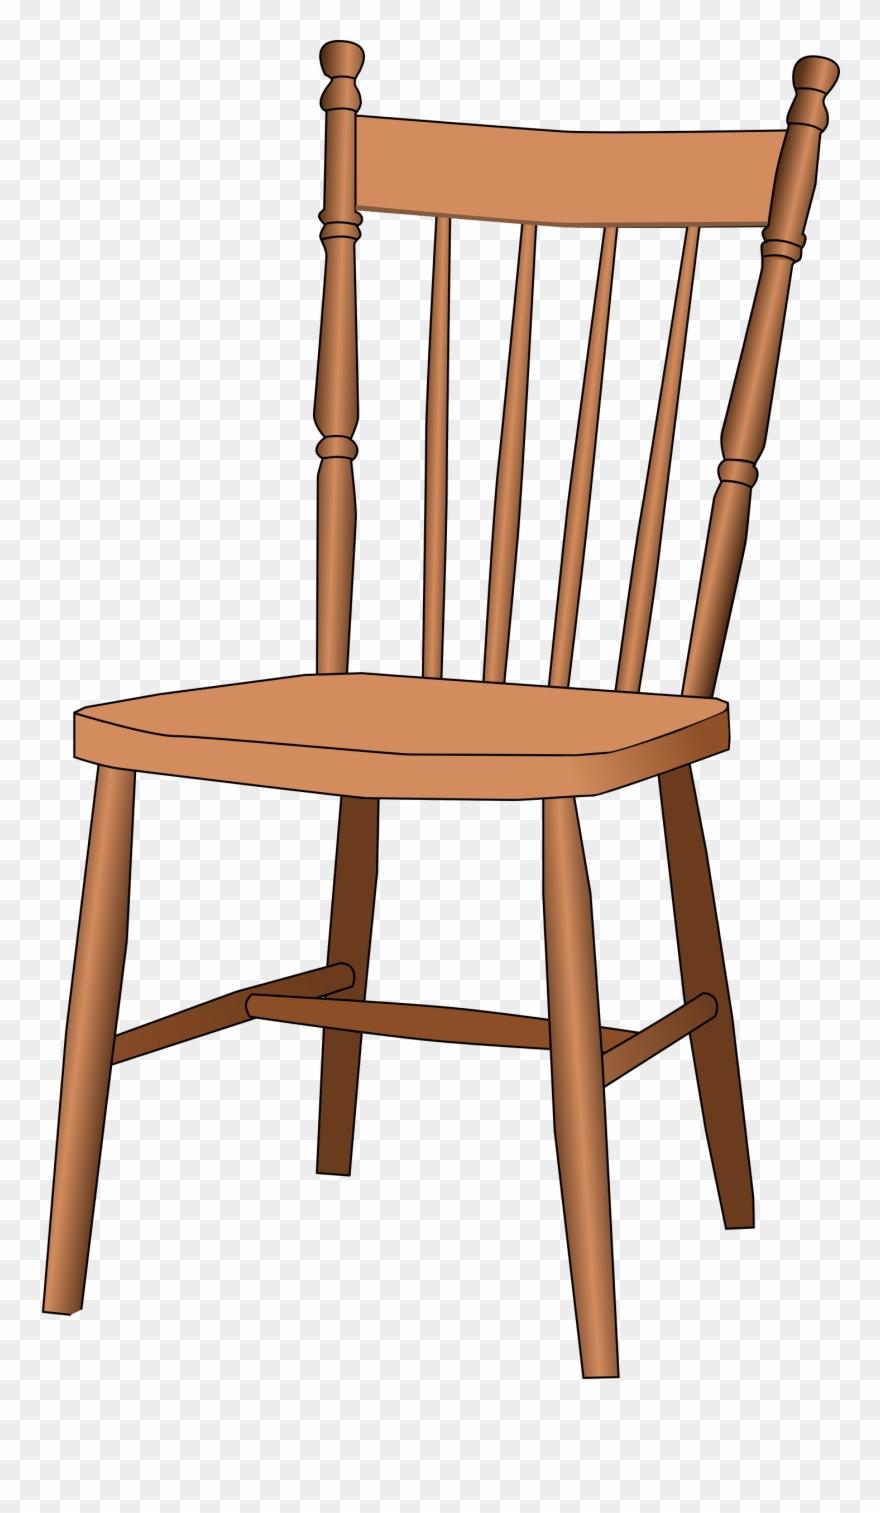 Clipart wooden chair clipart stock Armchair Clipart Wooden Furniture - Chair Clipart - Png Download ... clipart stock